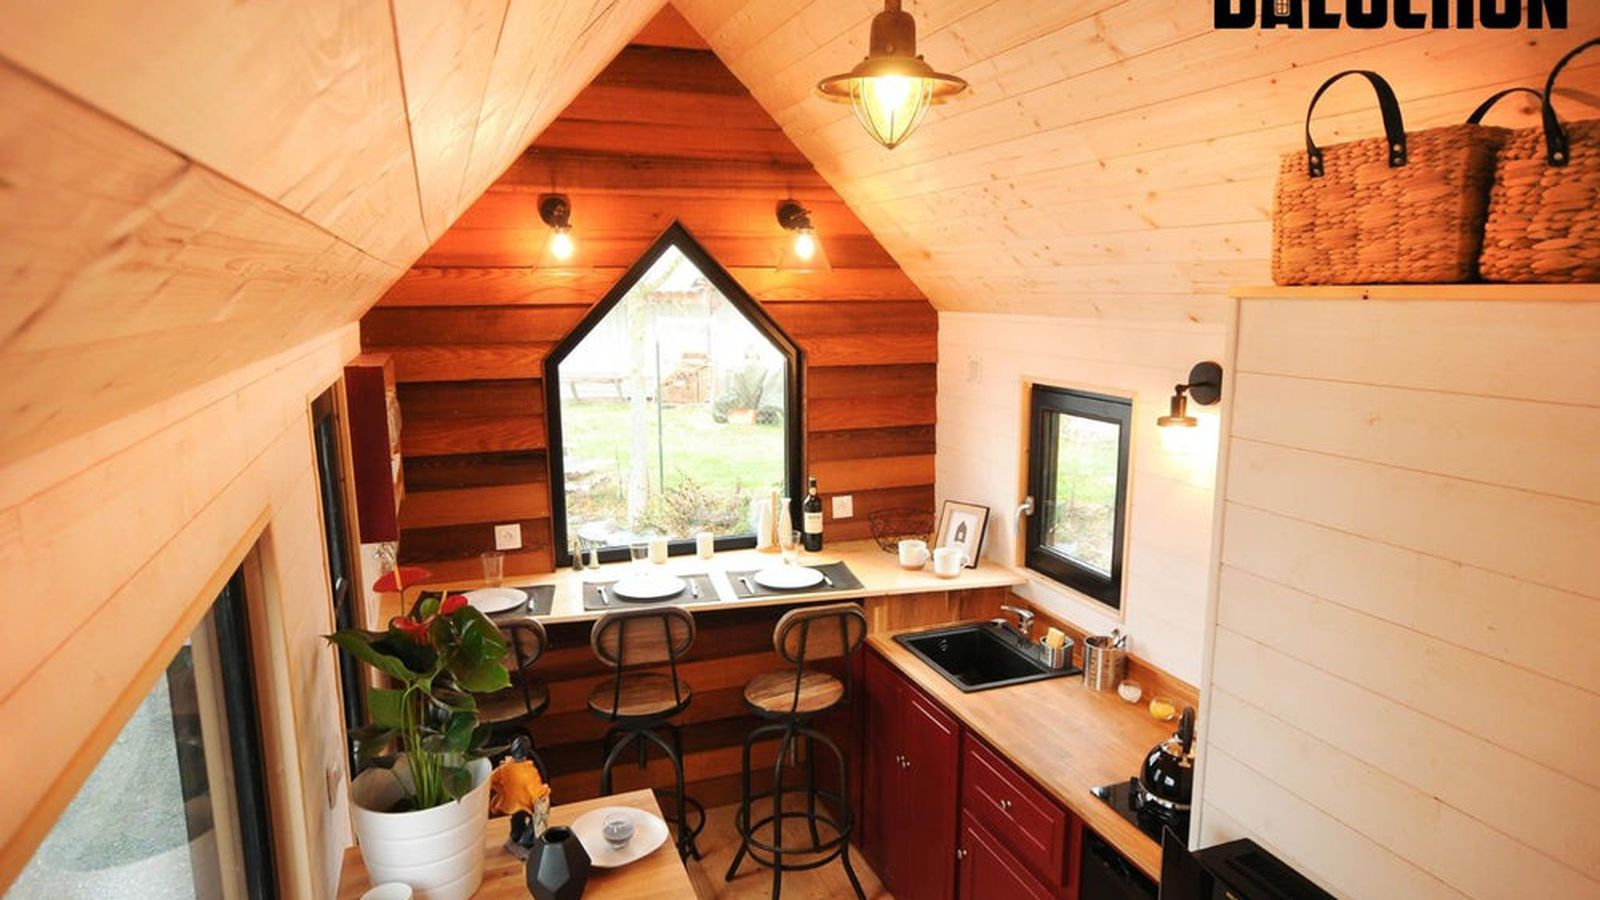 French tiny house comfortably fits family of three